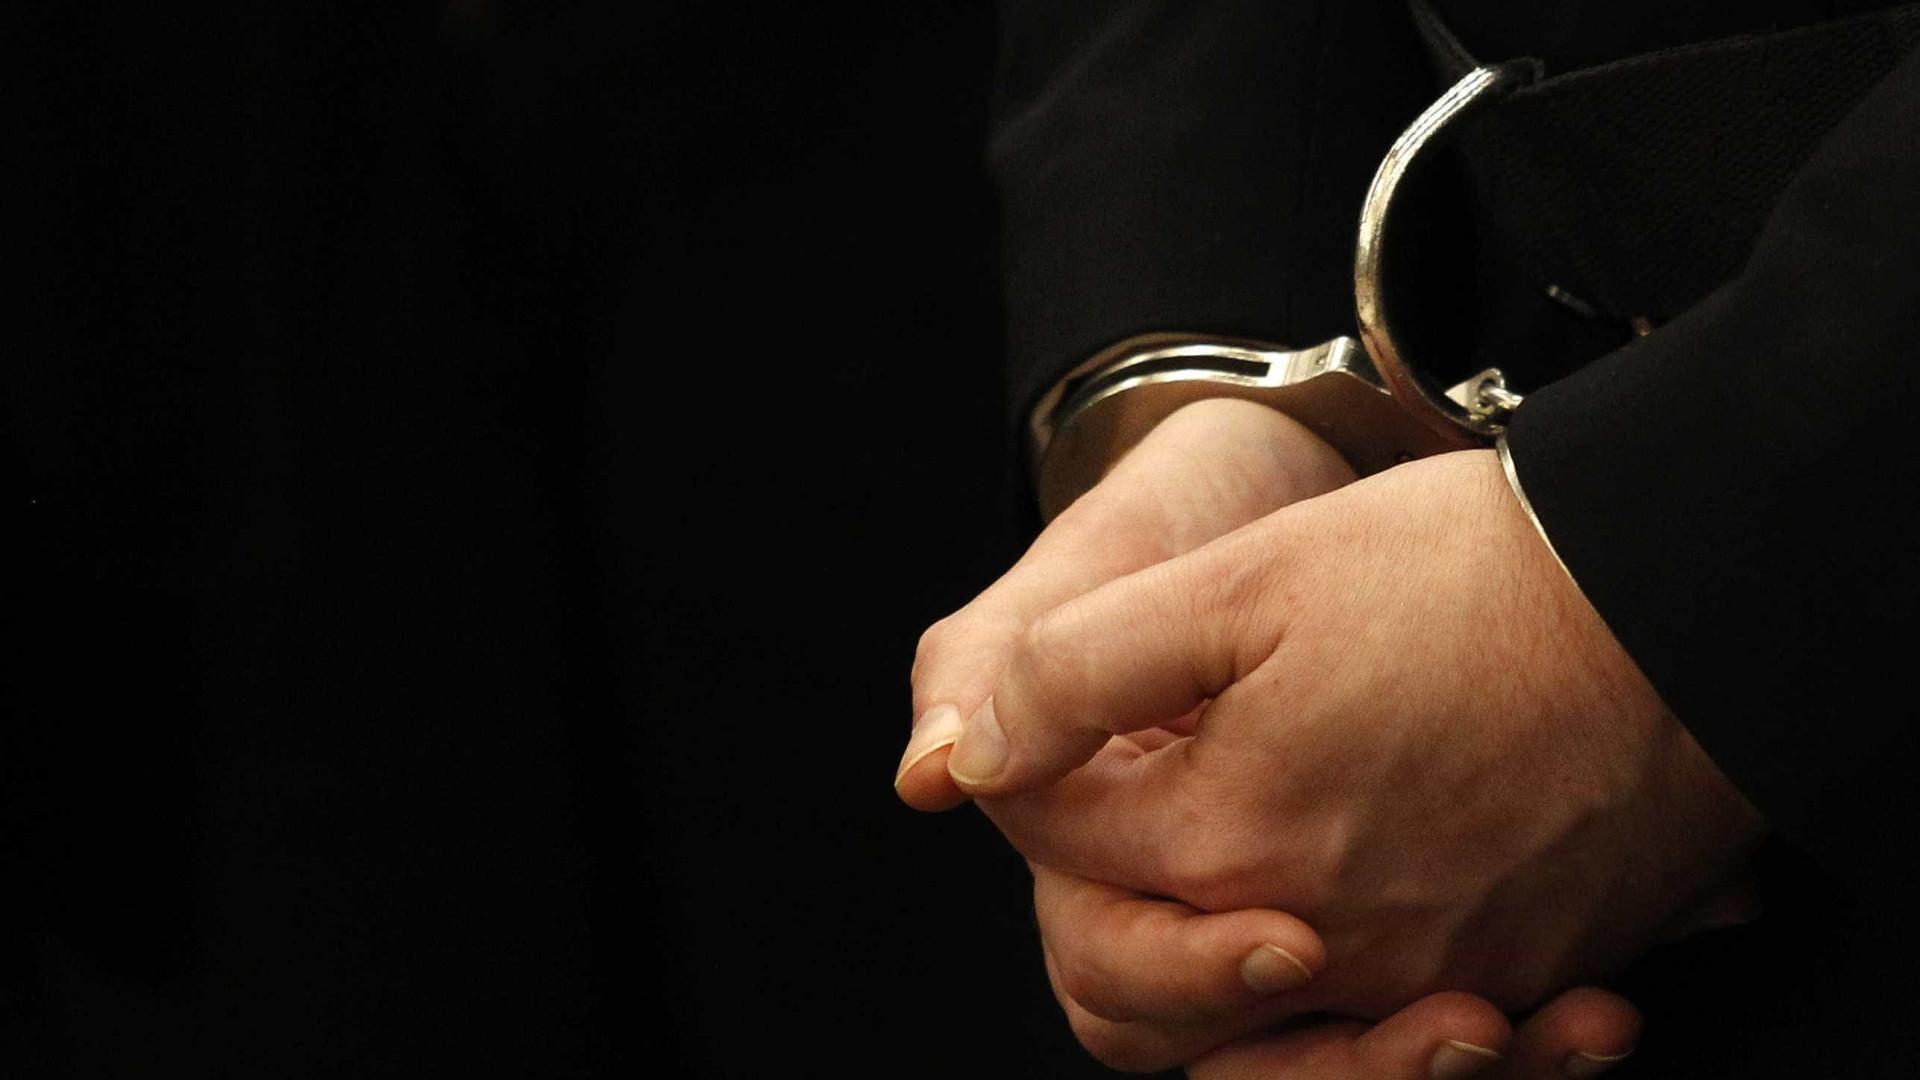 Detido homem condenado por abuso sexual de menores em fuga desde 2012